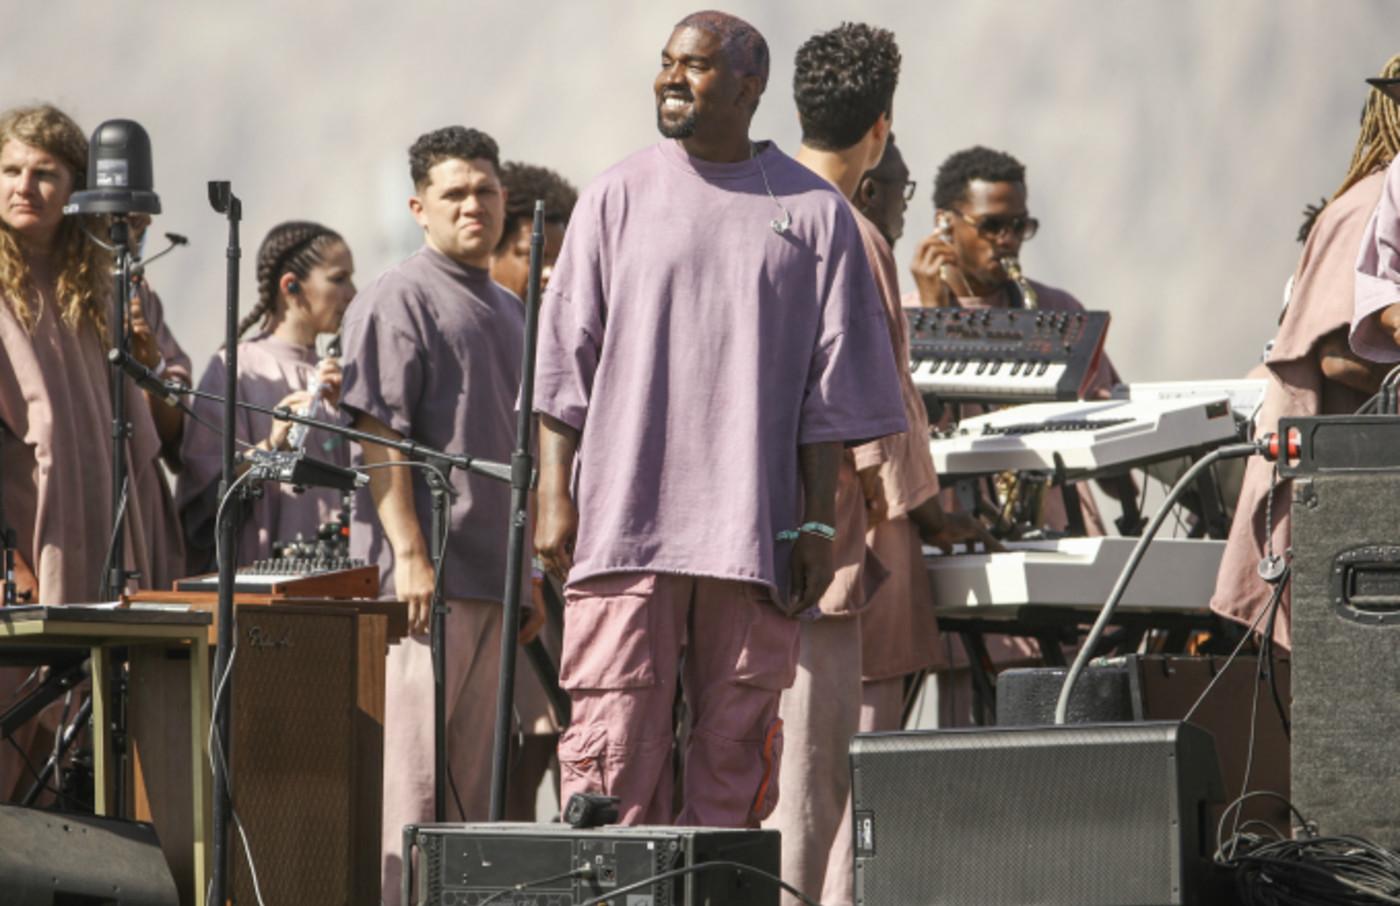 Kanye West performs Sunday Service